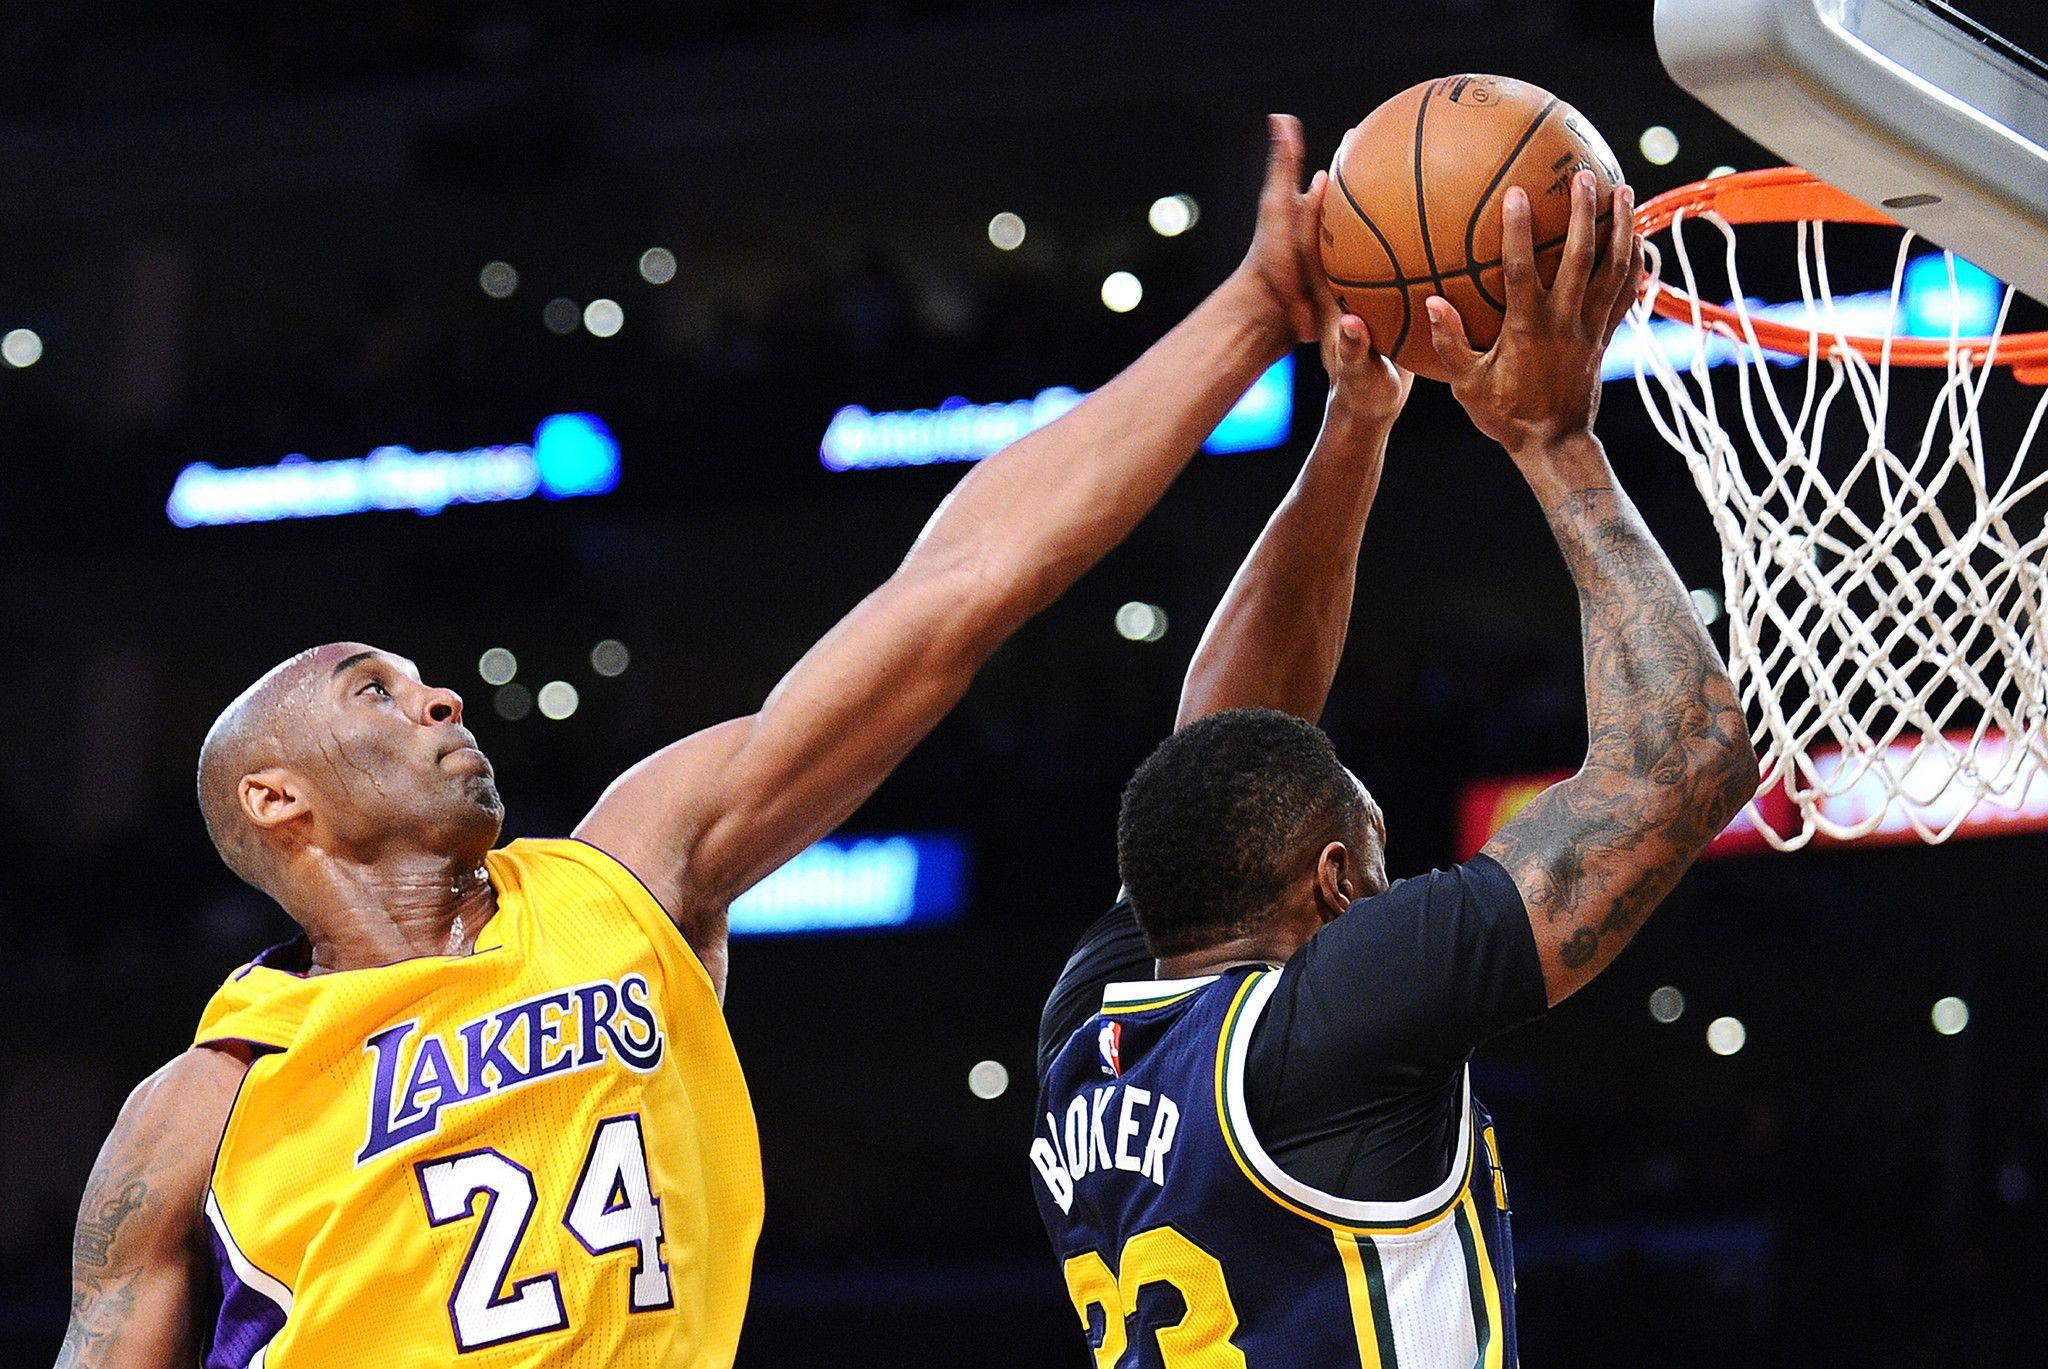 1a4156af8c73 Kobe Bryant s last game  A Hollywood ending for a Los Angeles legend ...